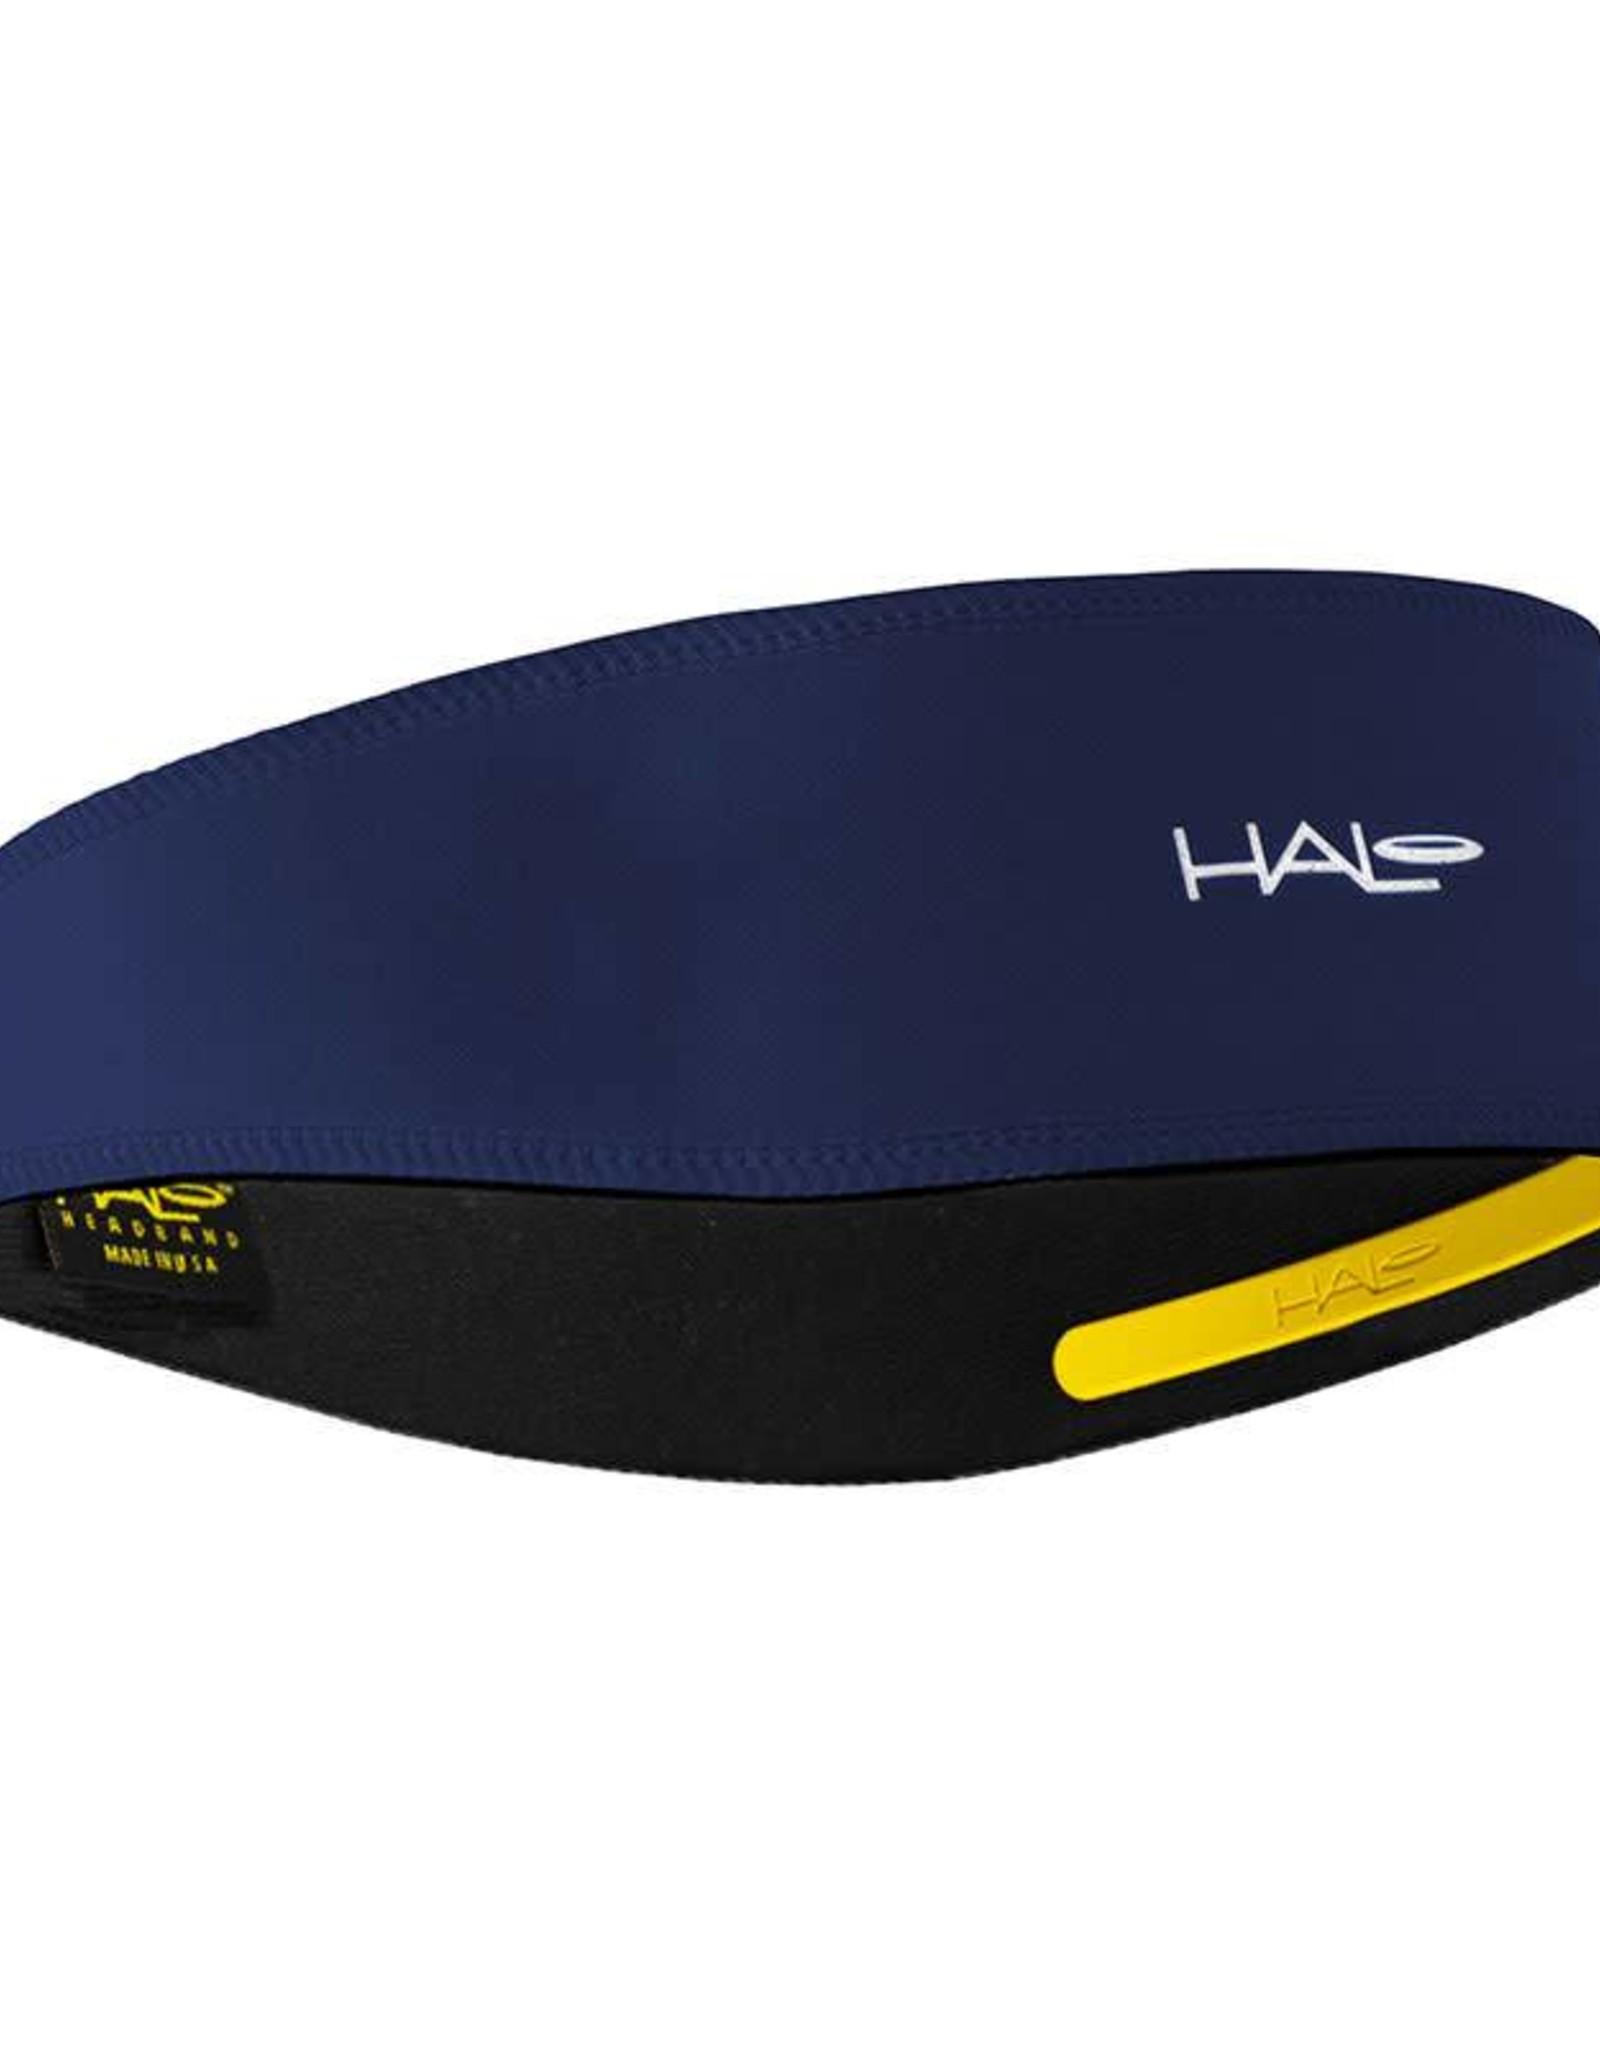 Halo II Pullover Headband: Navy Blue